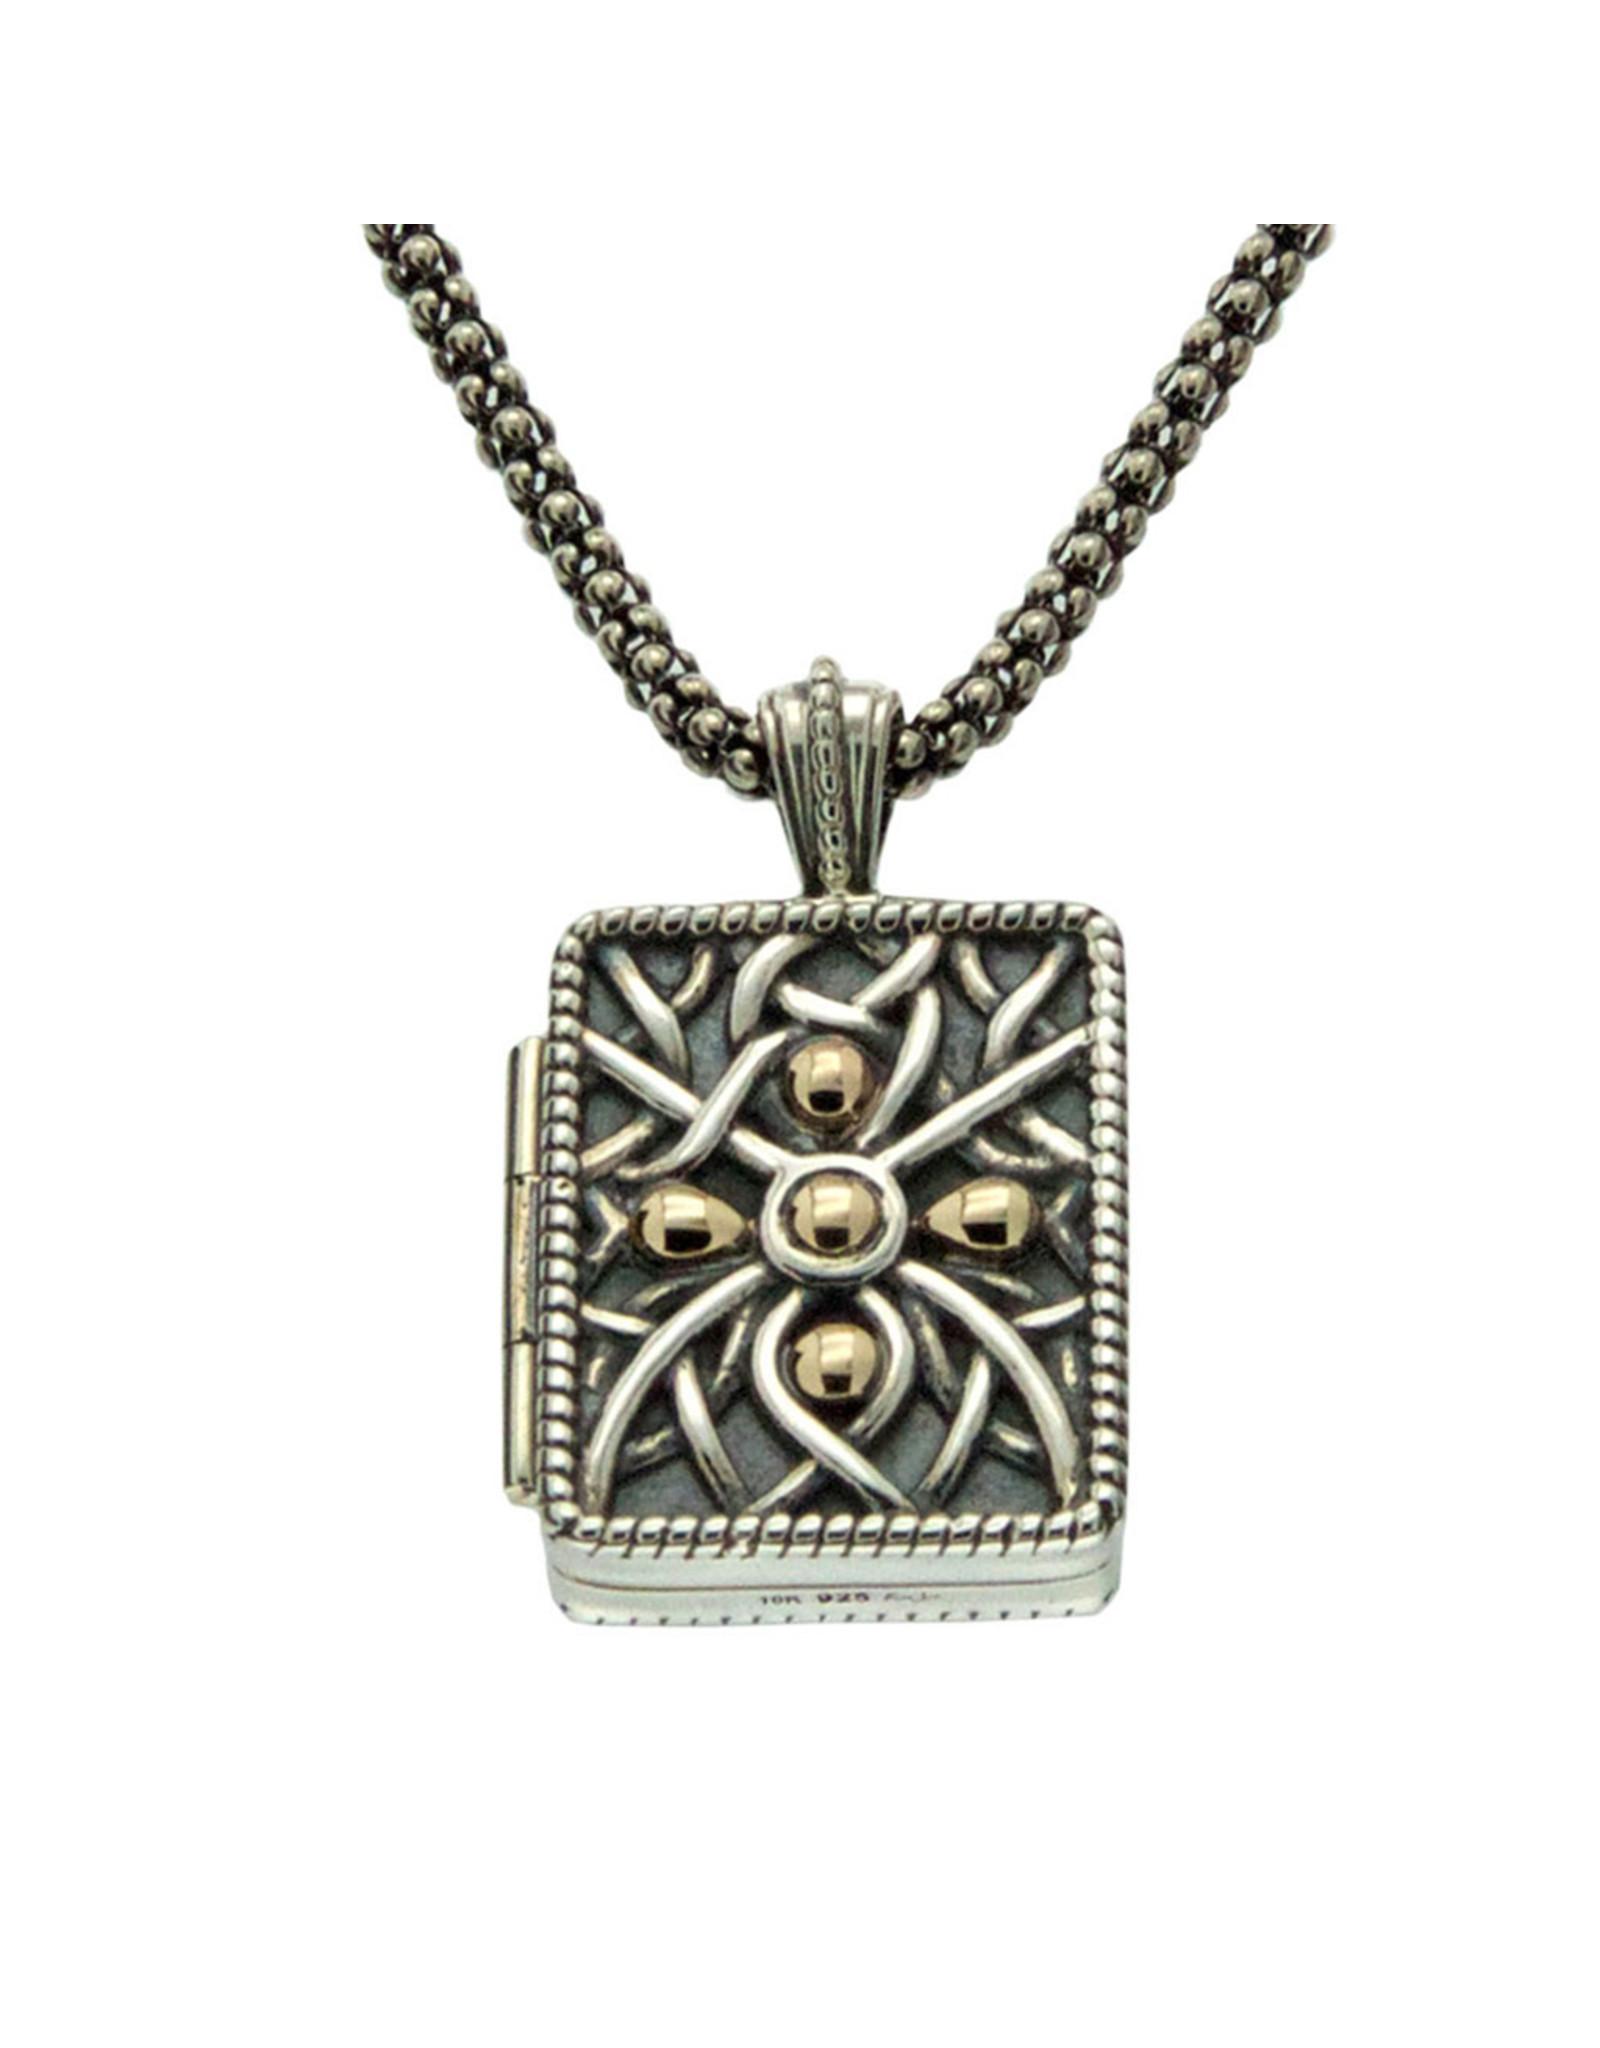 Keith Jack Oxidized Silver + Gold Unisex Locket